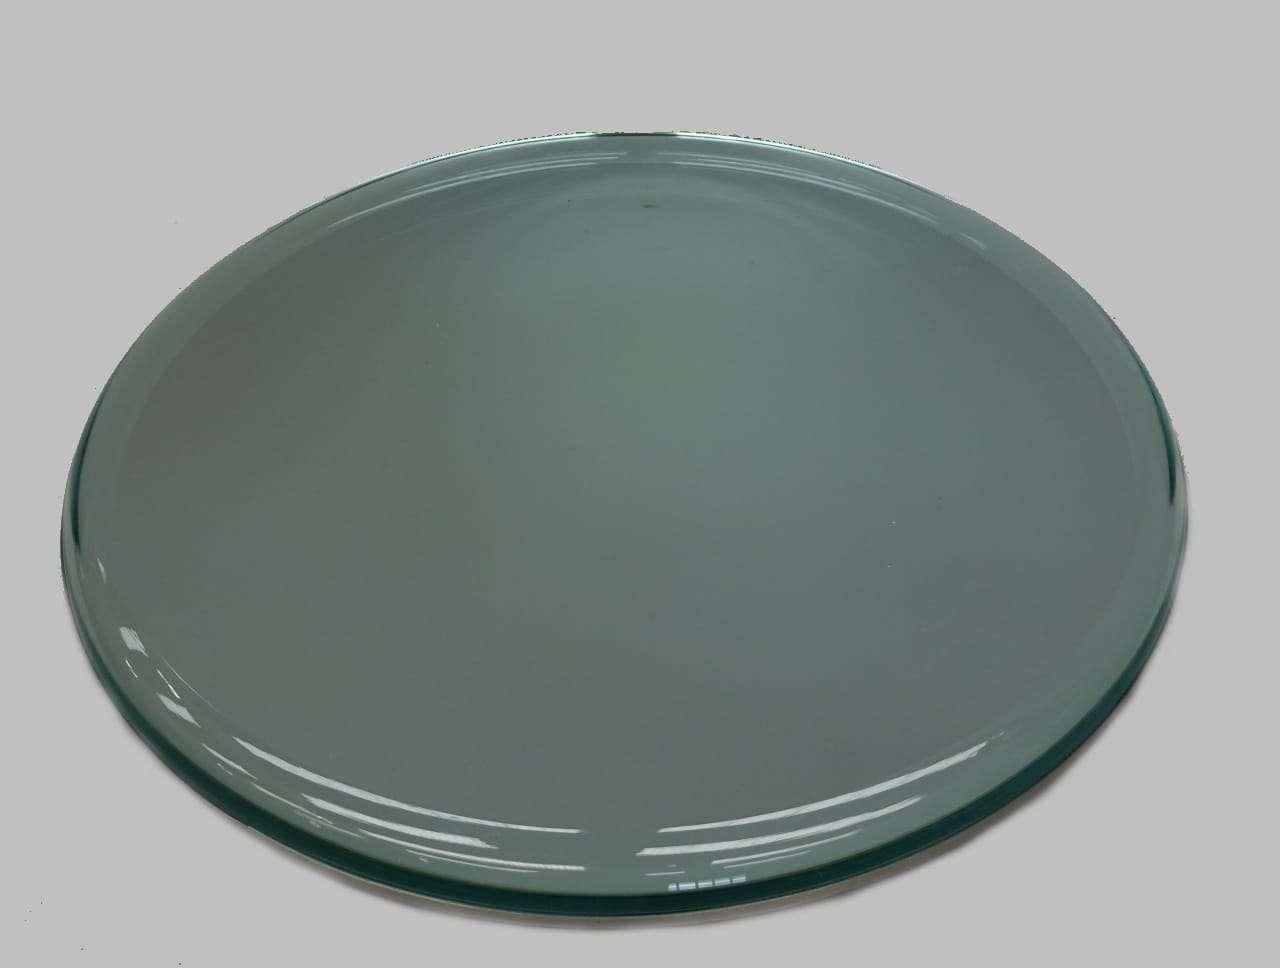 Specchiera Boffi Mercury Specchio 0518005